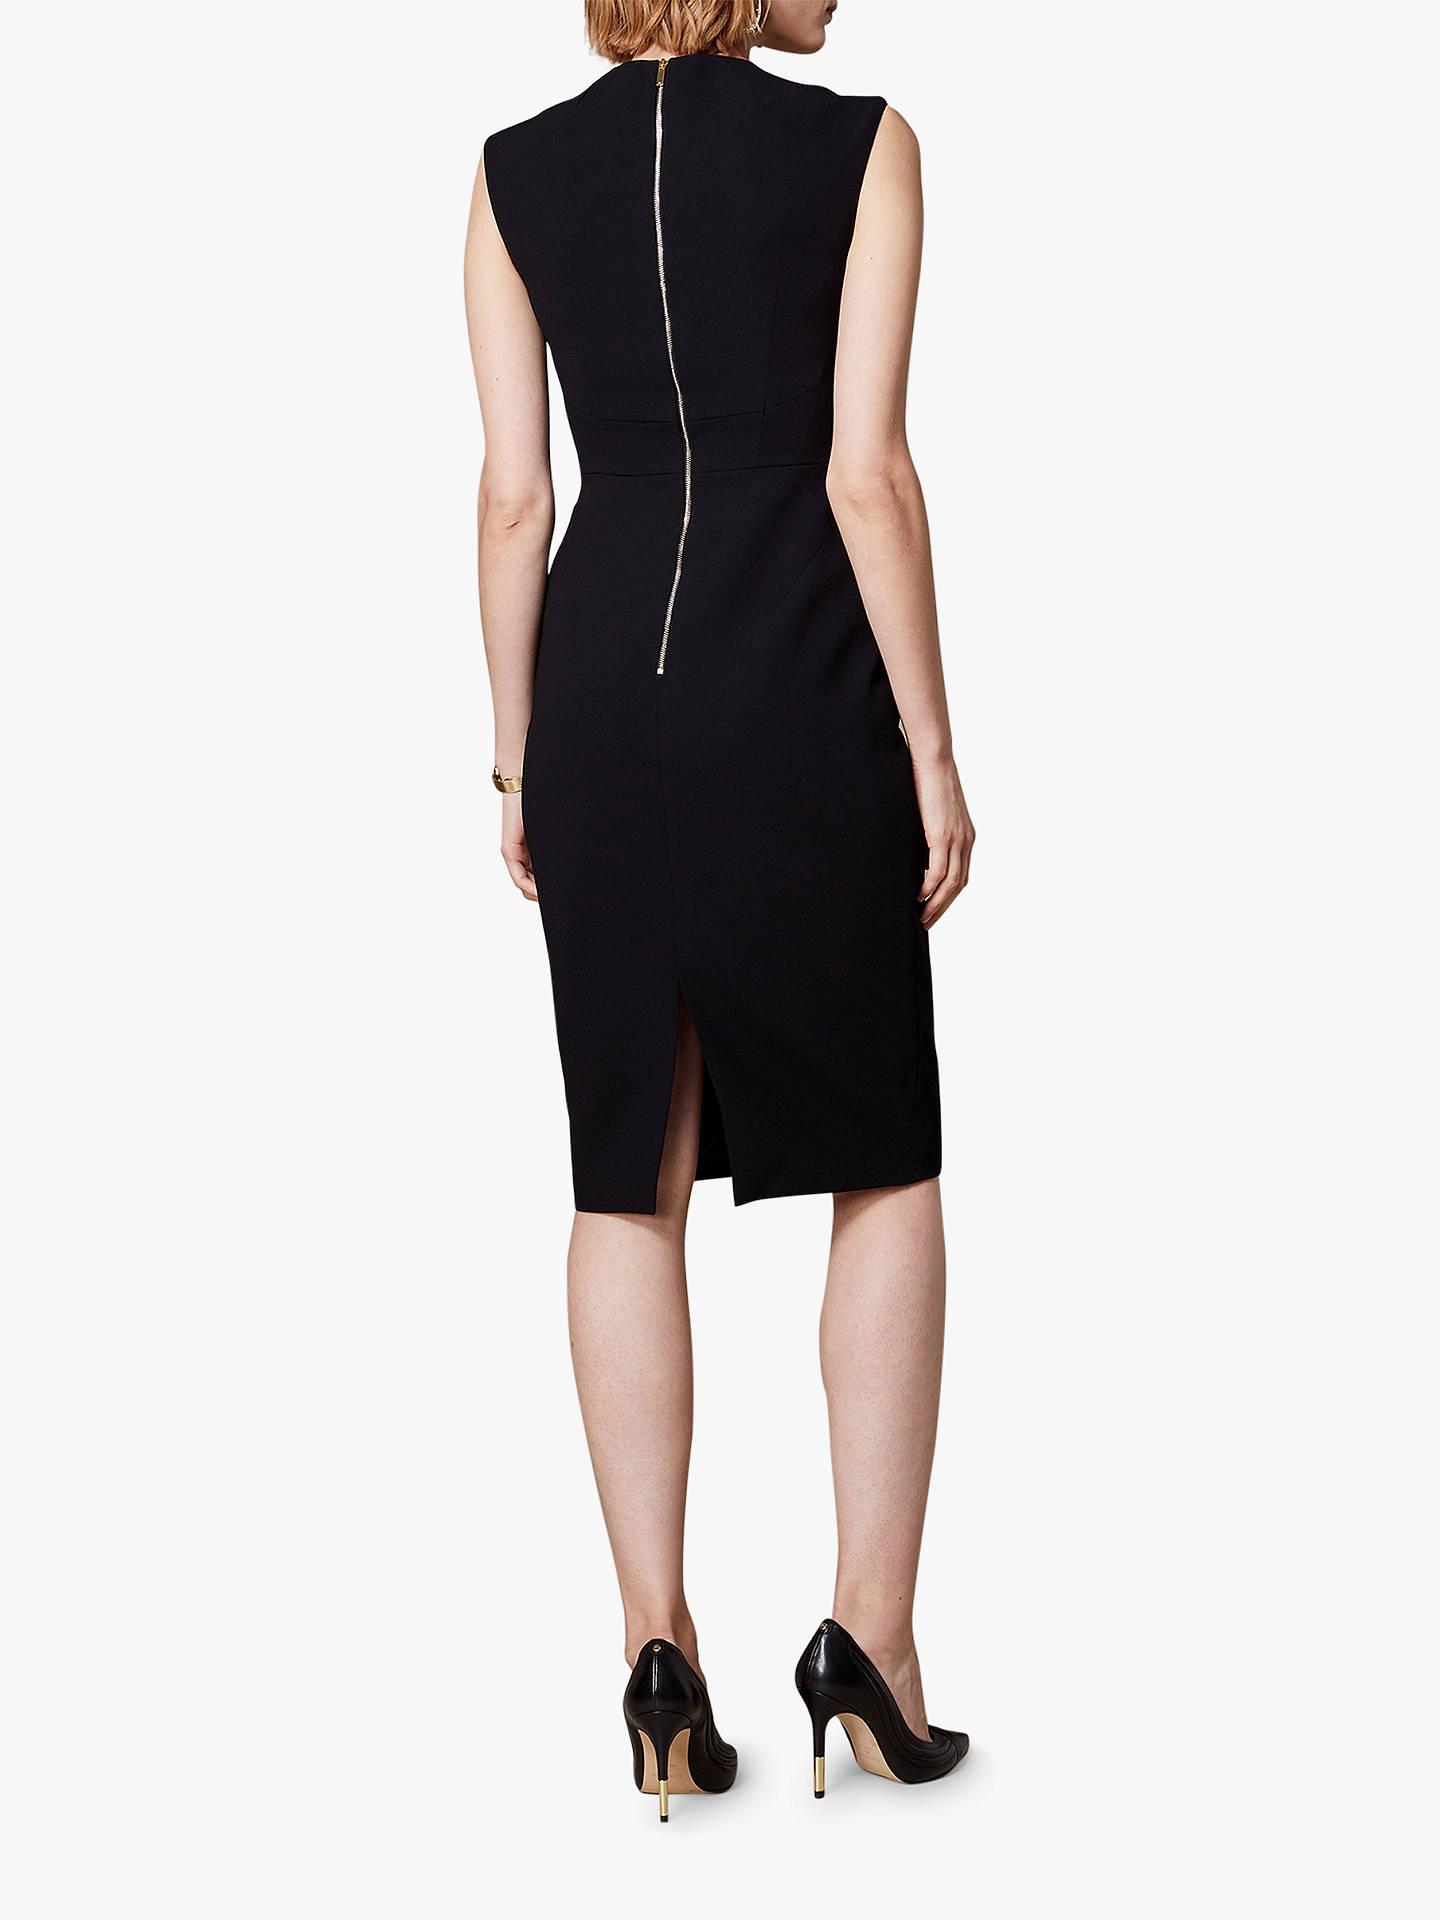 Karen millen black tailored contour bodycon dress